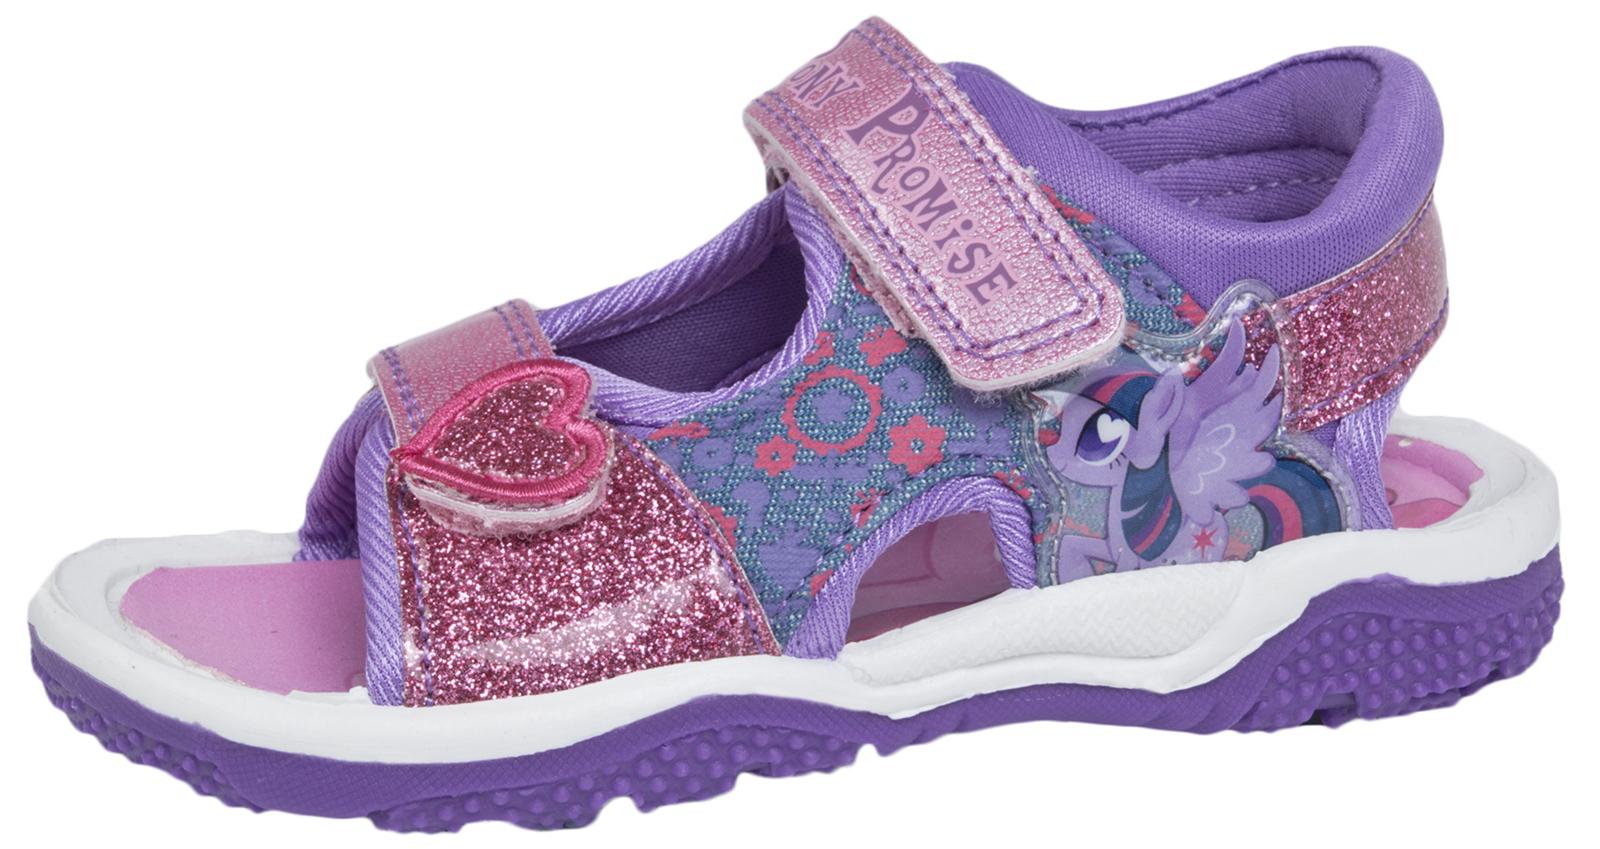 eff9c8d68dd7 My Little Pony Glitter Sandals Adjustable Sports Summer Beach Shoes Girls  Size